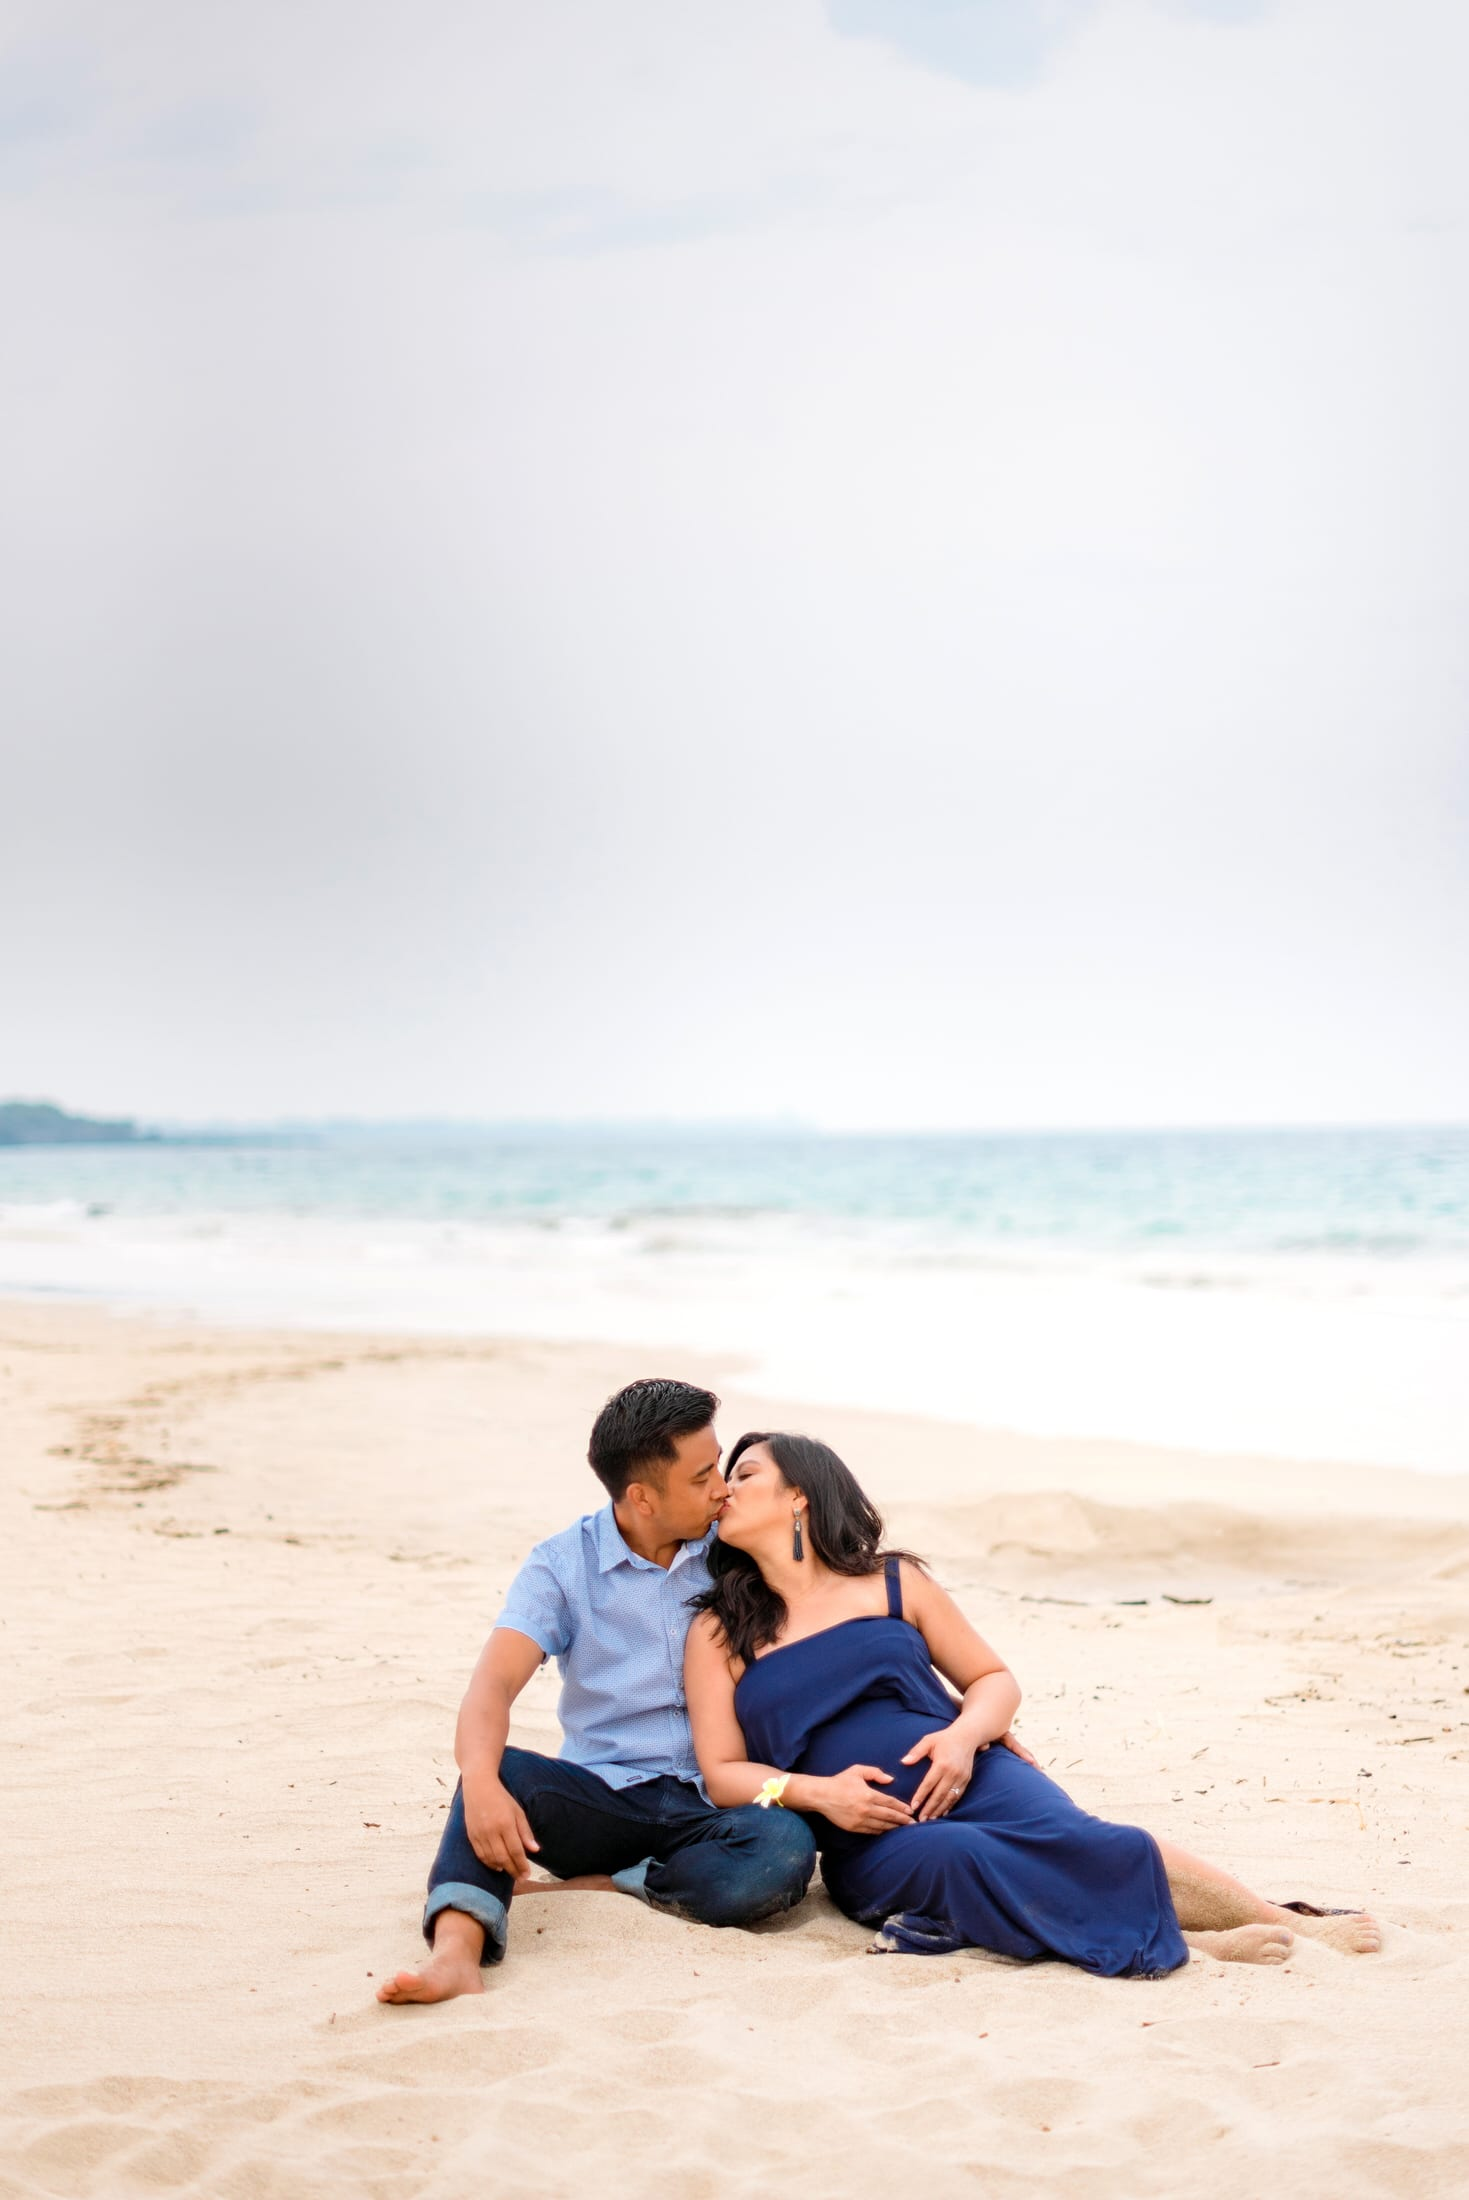 Hawaii-Cloudy-Maternity-Photographer23-9.jpg